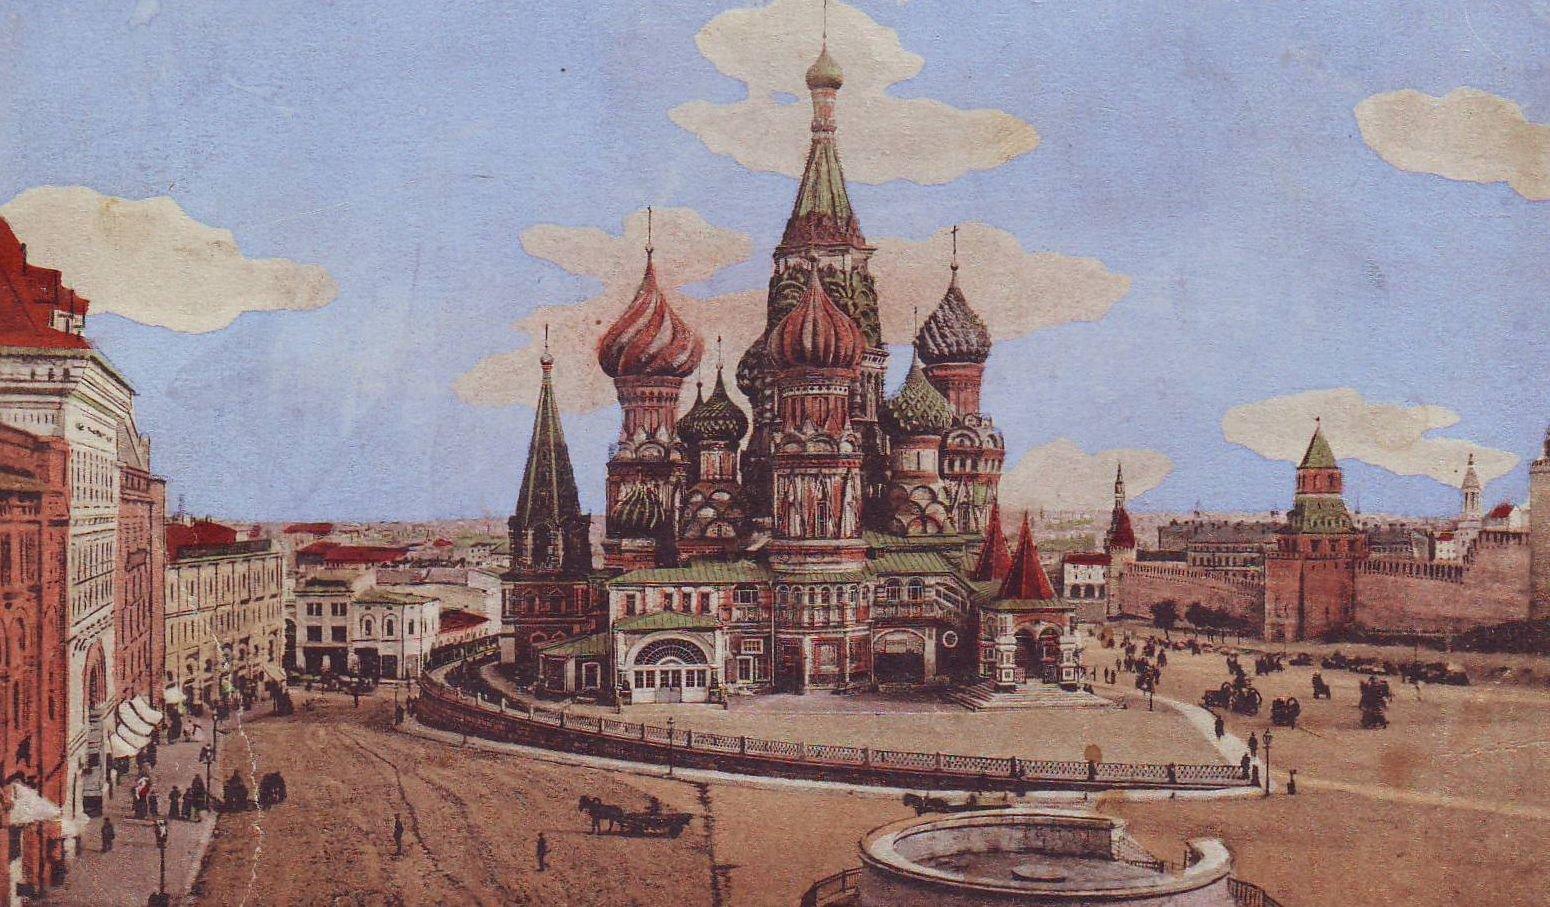 Открытки сайт москвы, приколы картинки аниме